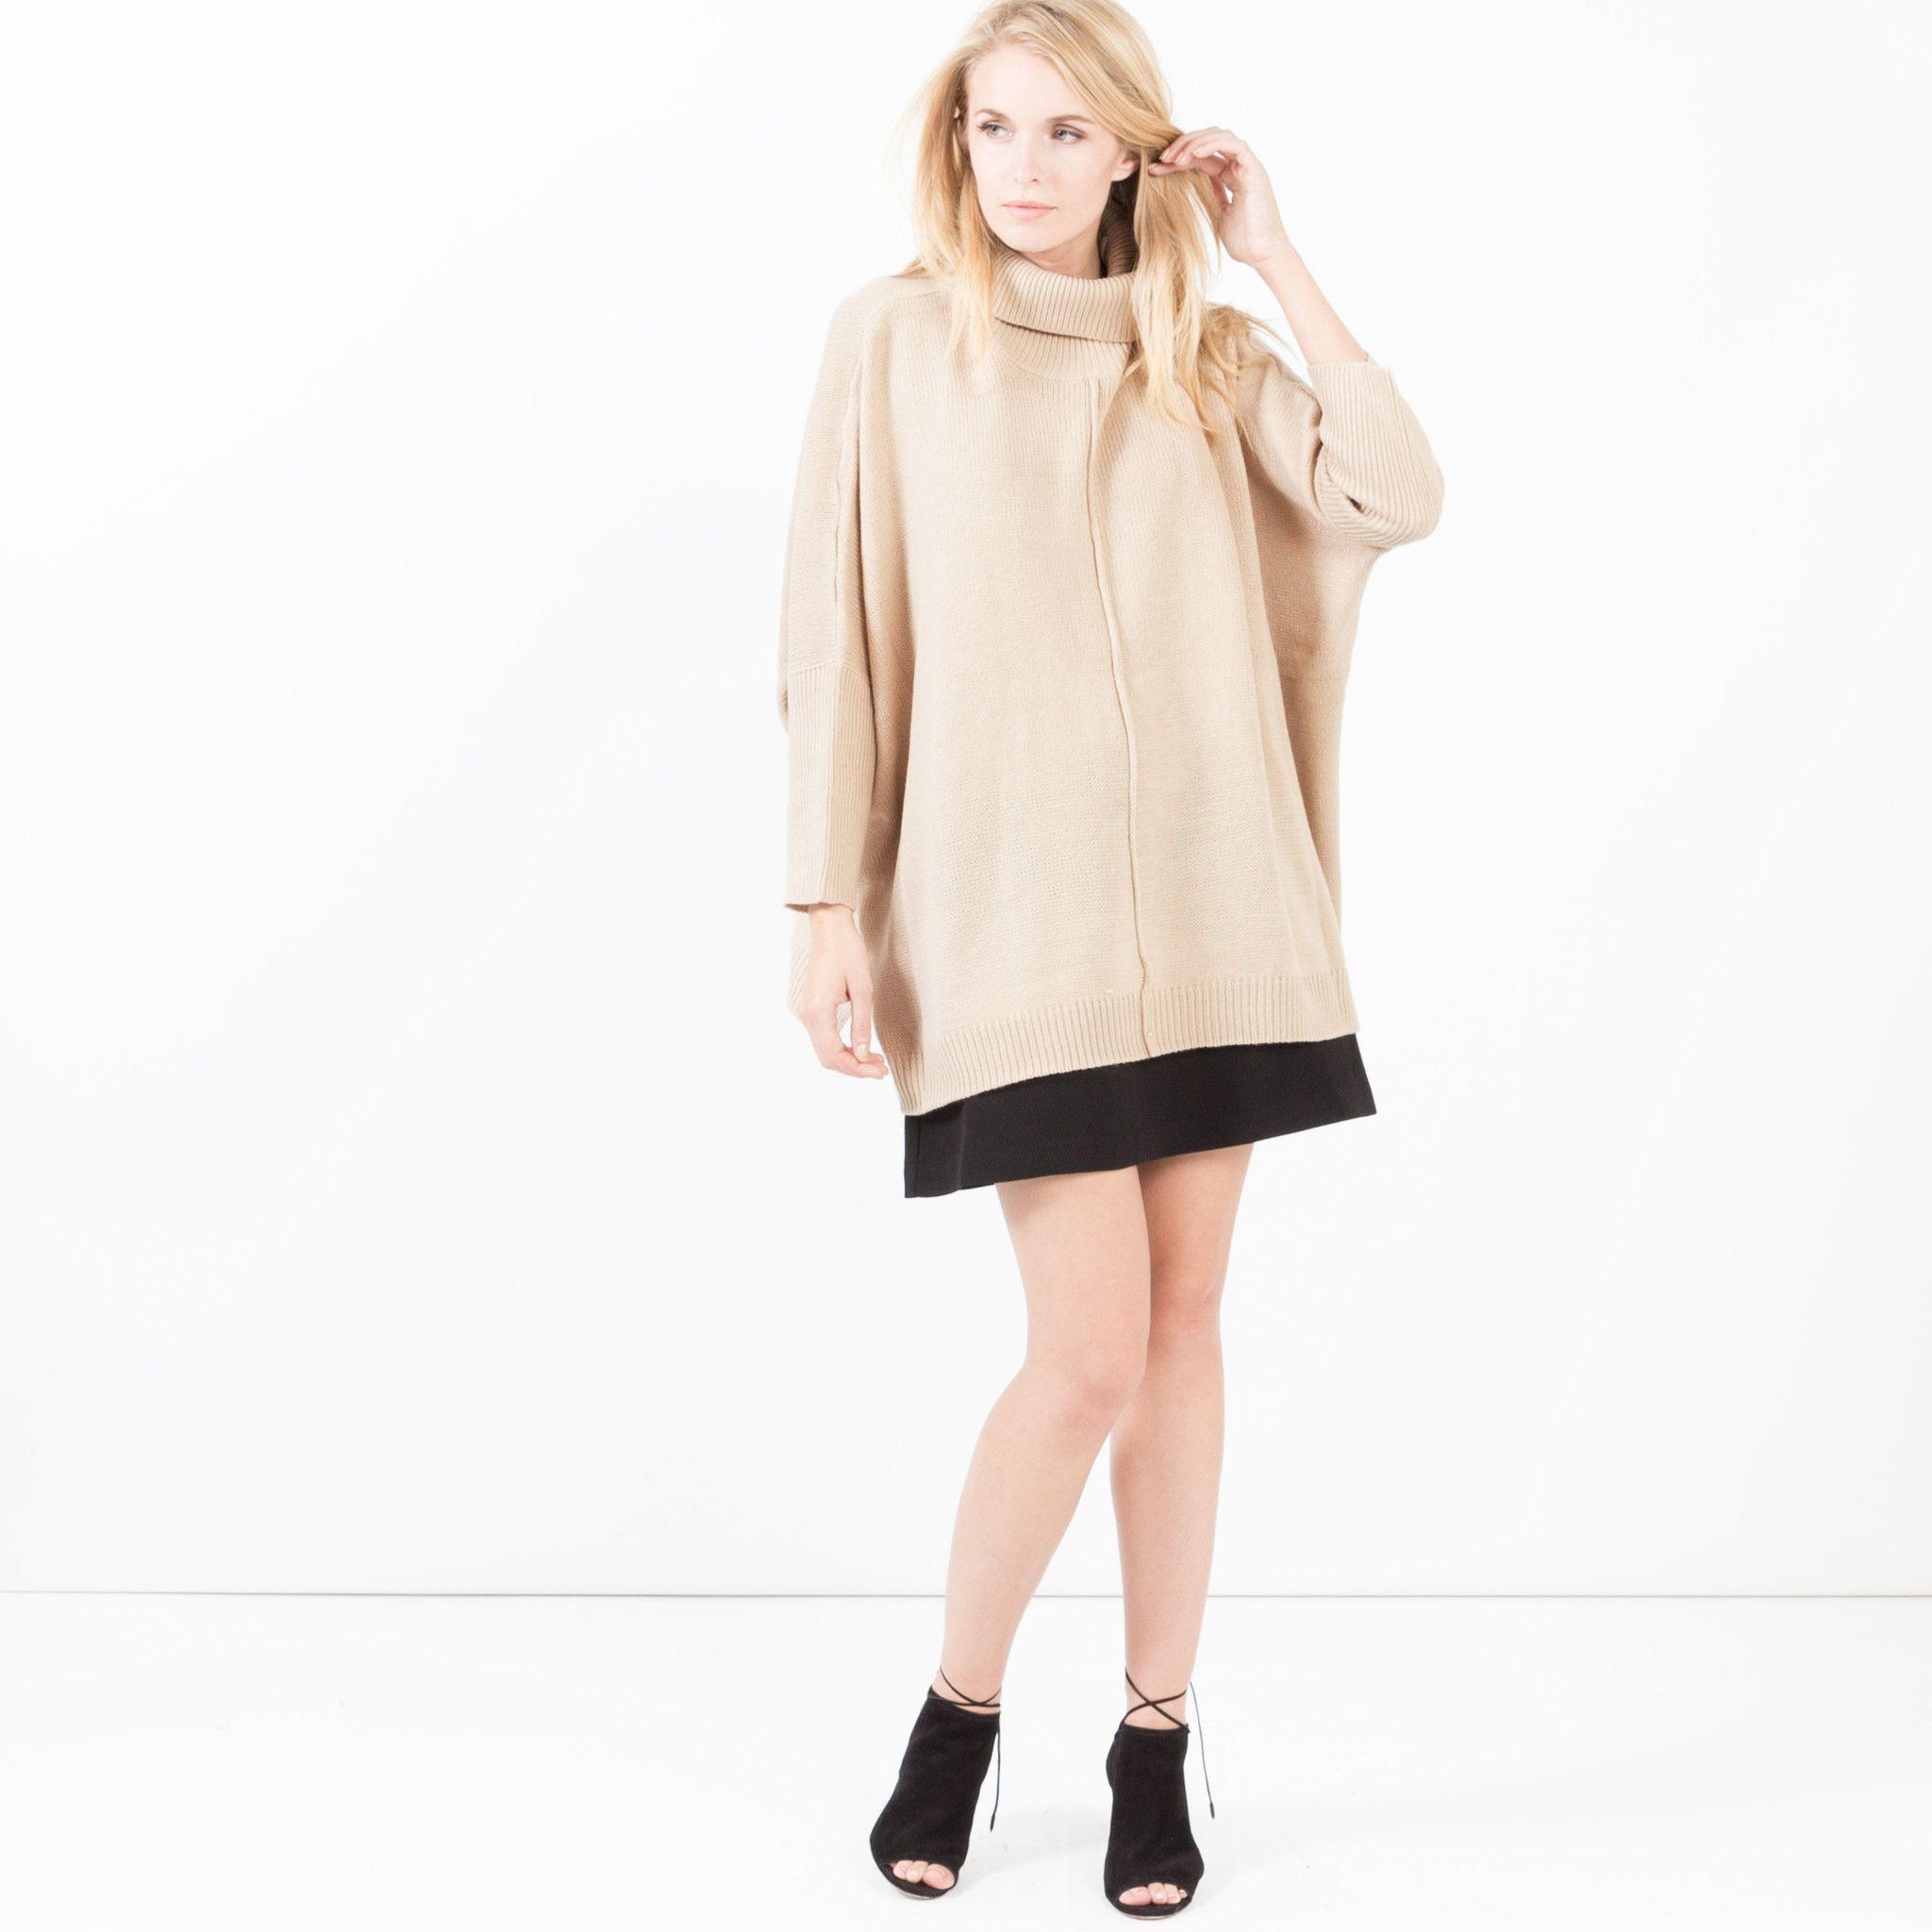 Kara Oversized Turtleneck Sweater (Beige)